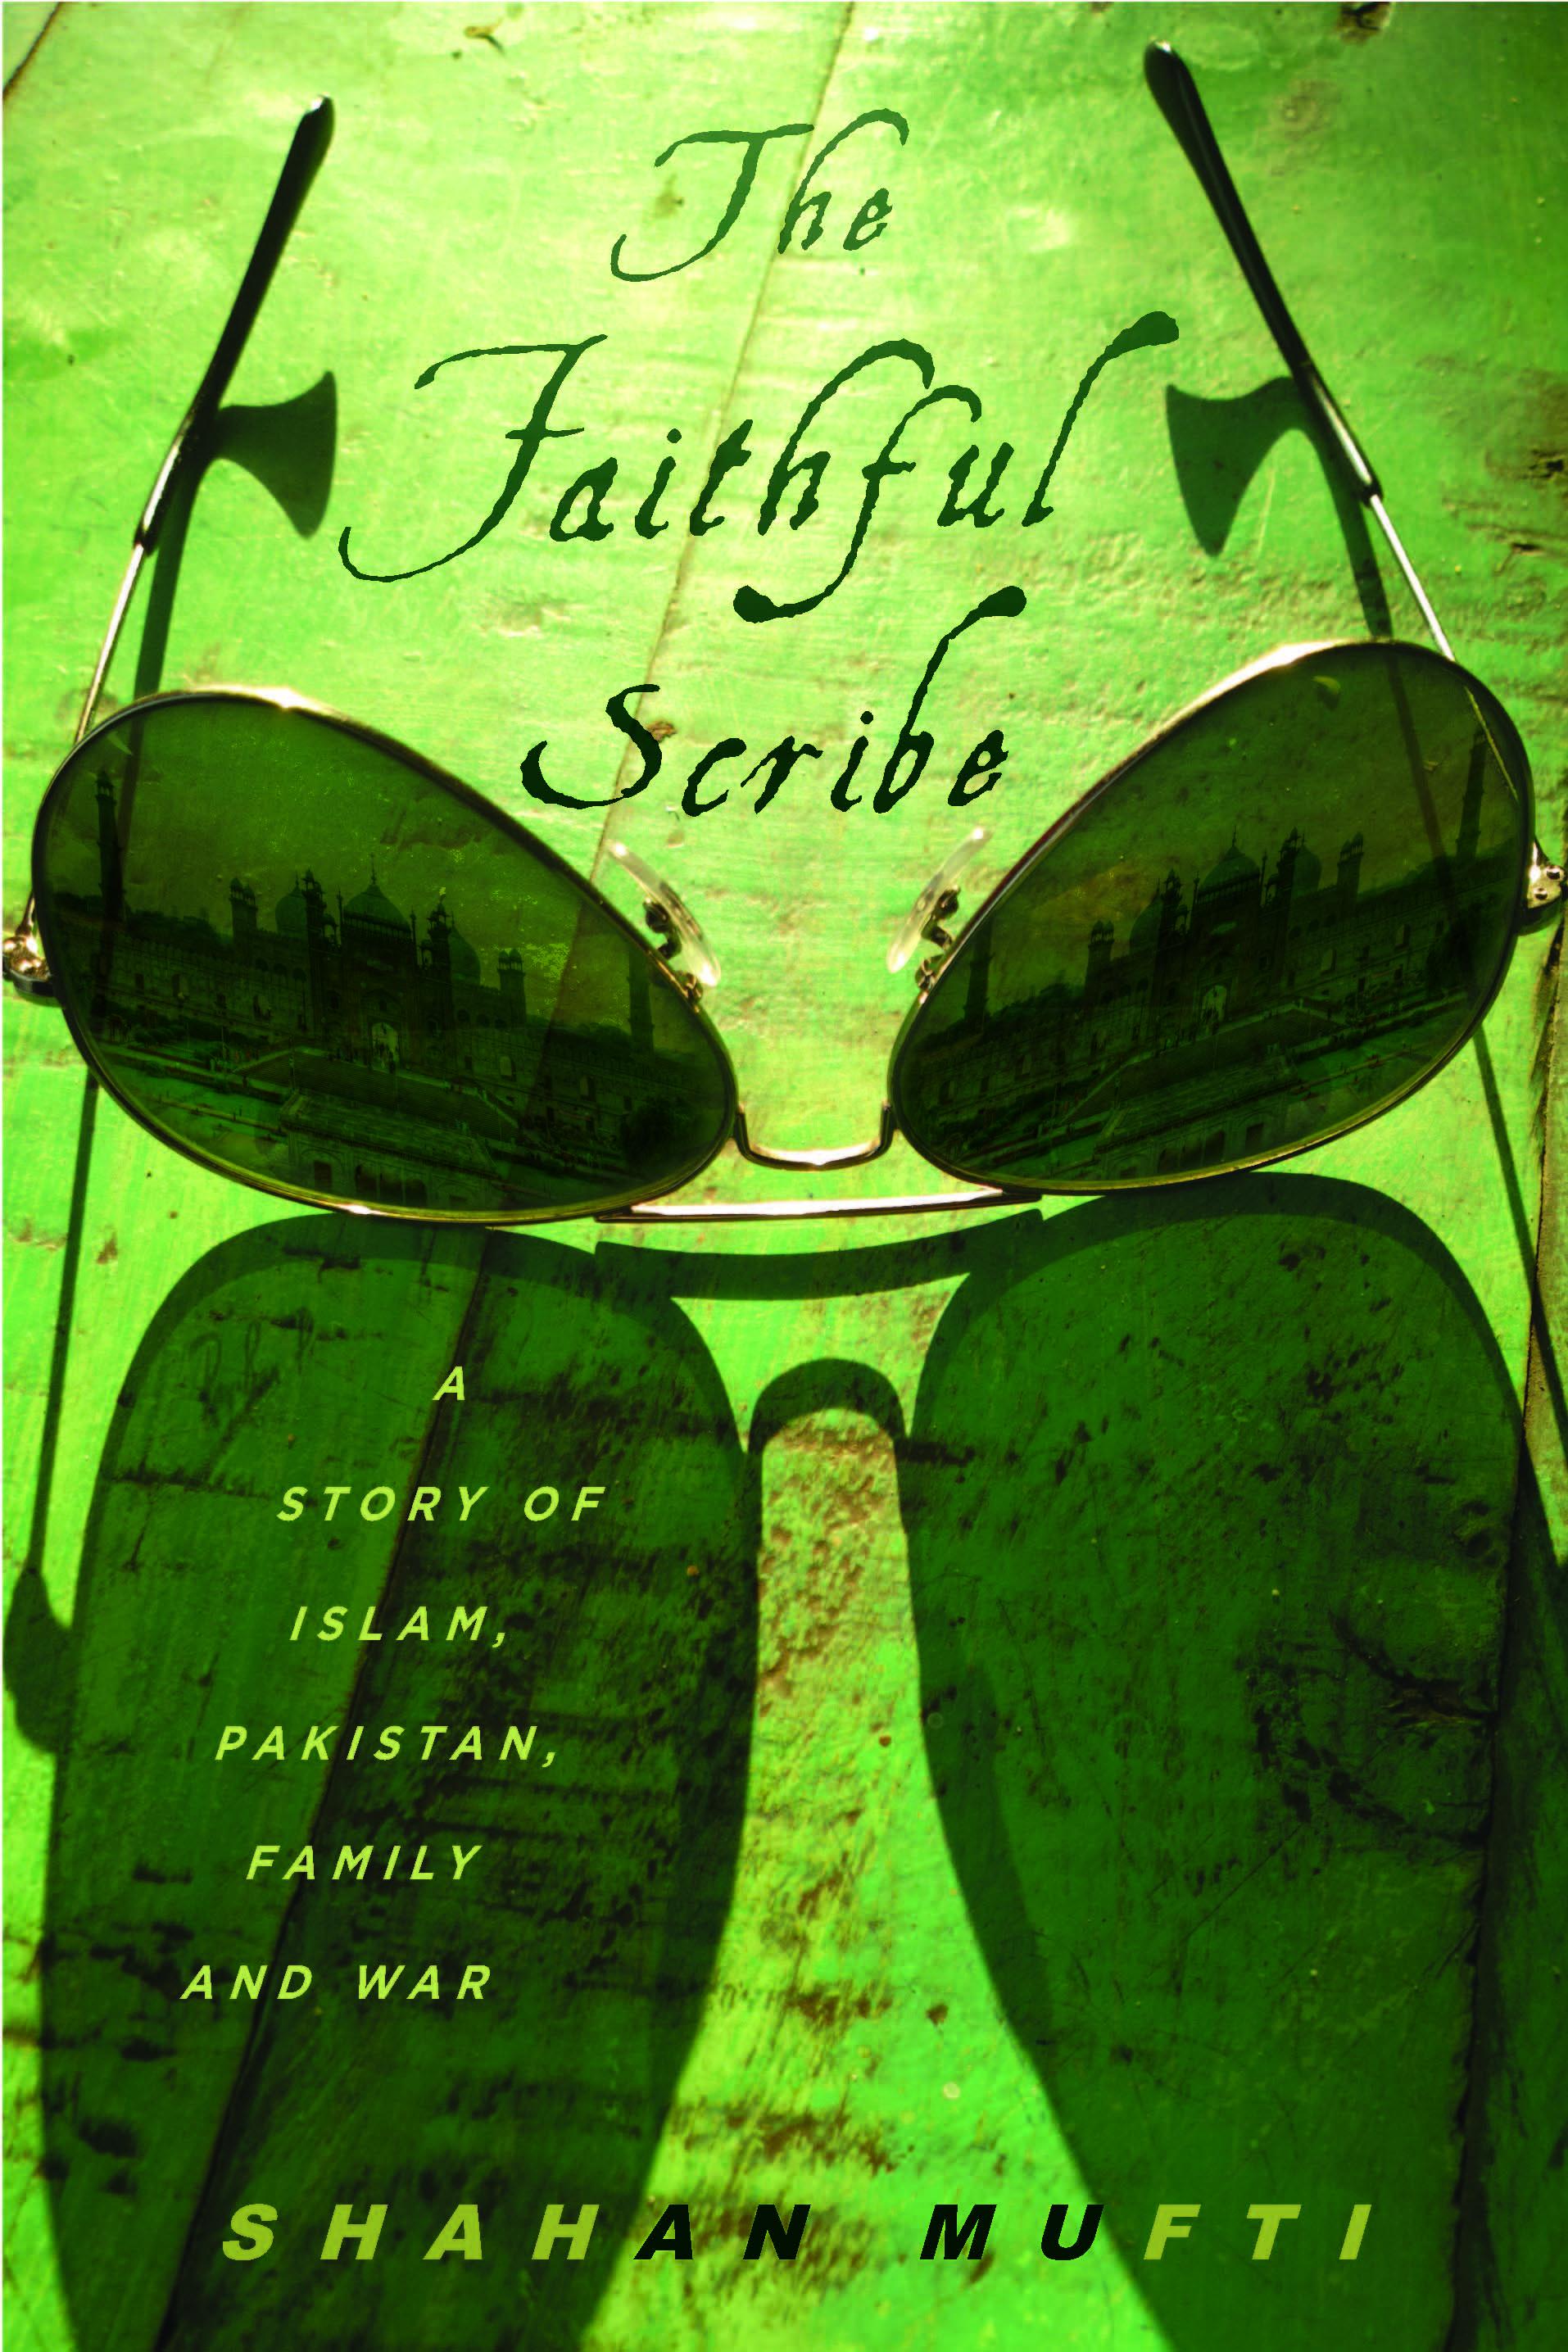 Book Launch: The Faithful Scribe by Shahan Mufti, with Tunku Varadarajan